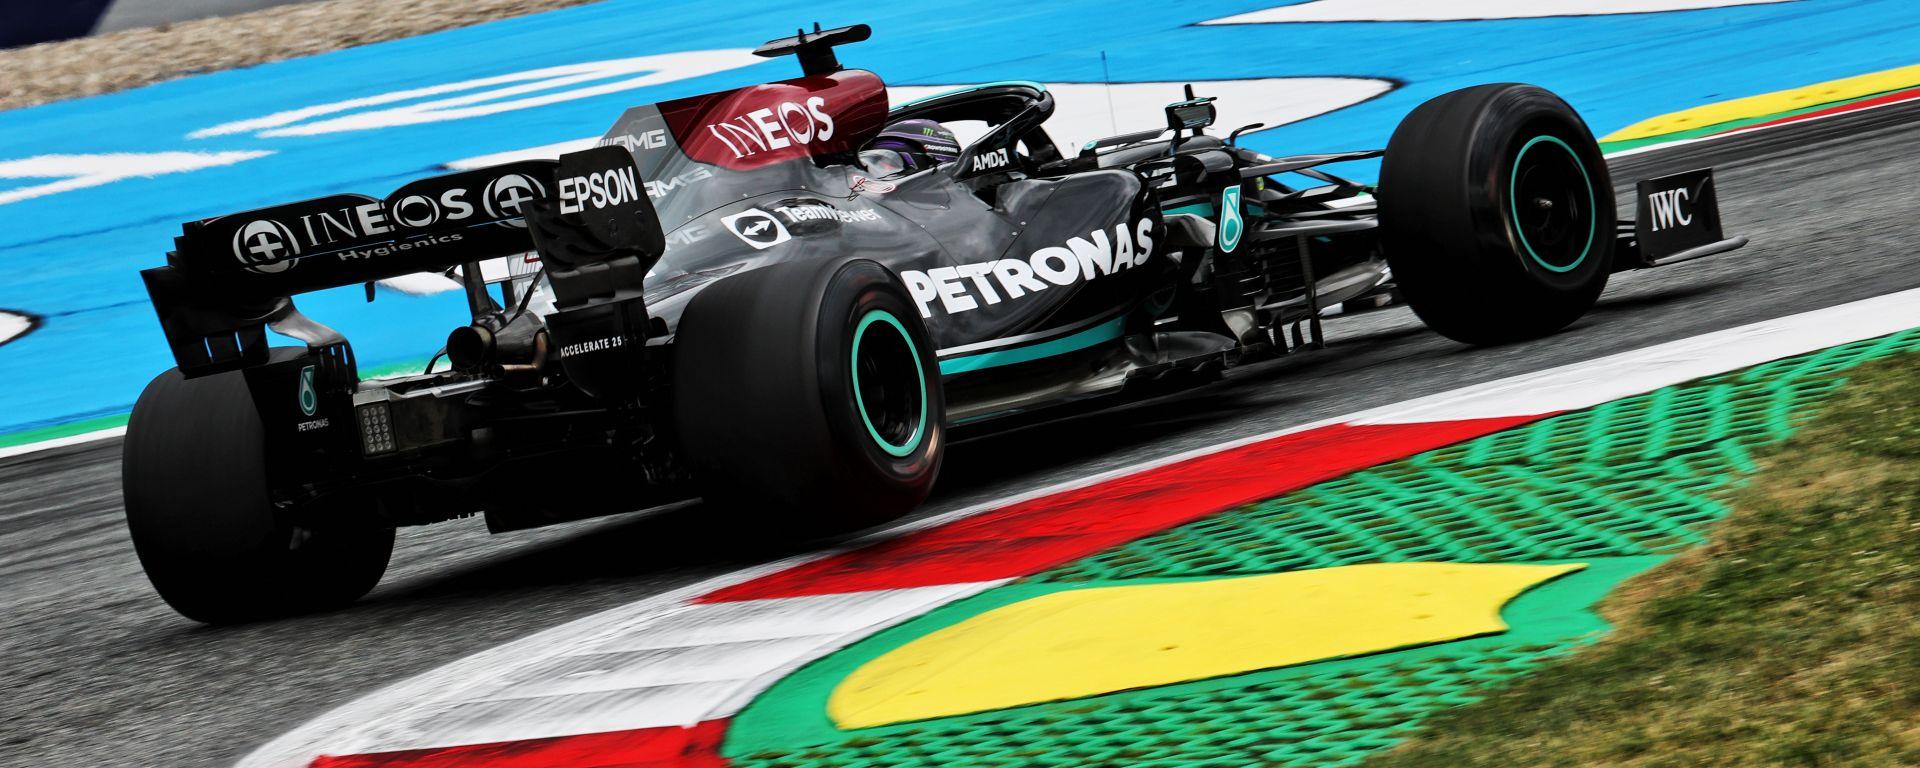 F1 GP Austria 2021, Spielberg: Lewis Hamilton (Mercedes AMG F1) prova le Pirelli proto